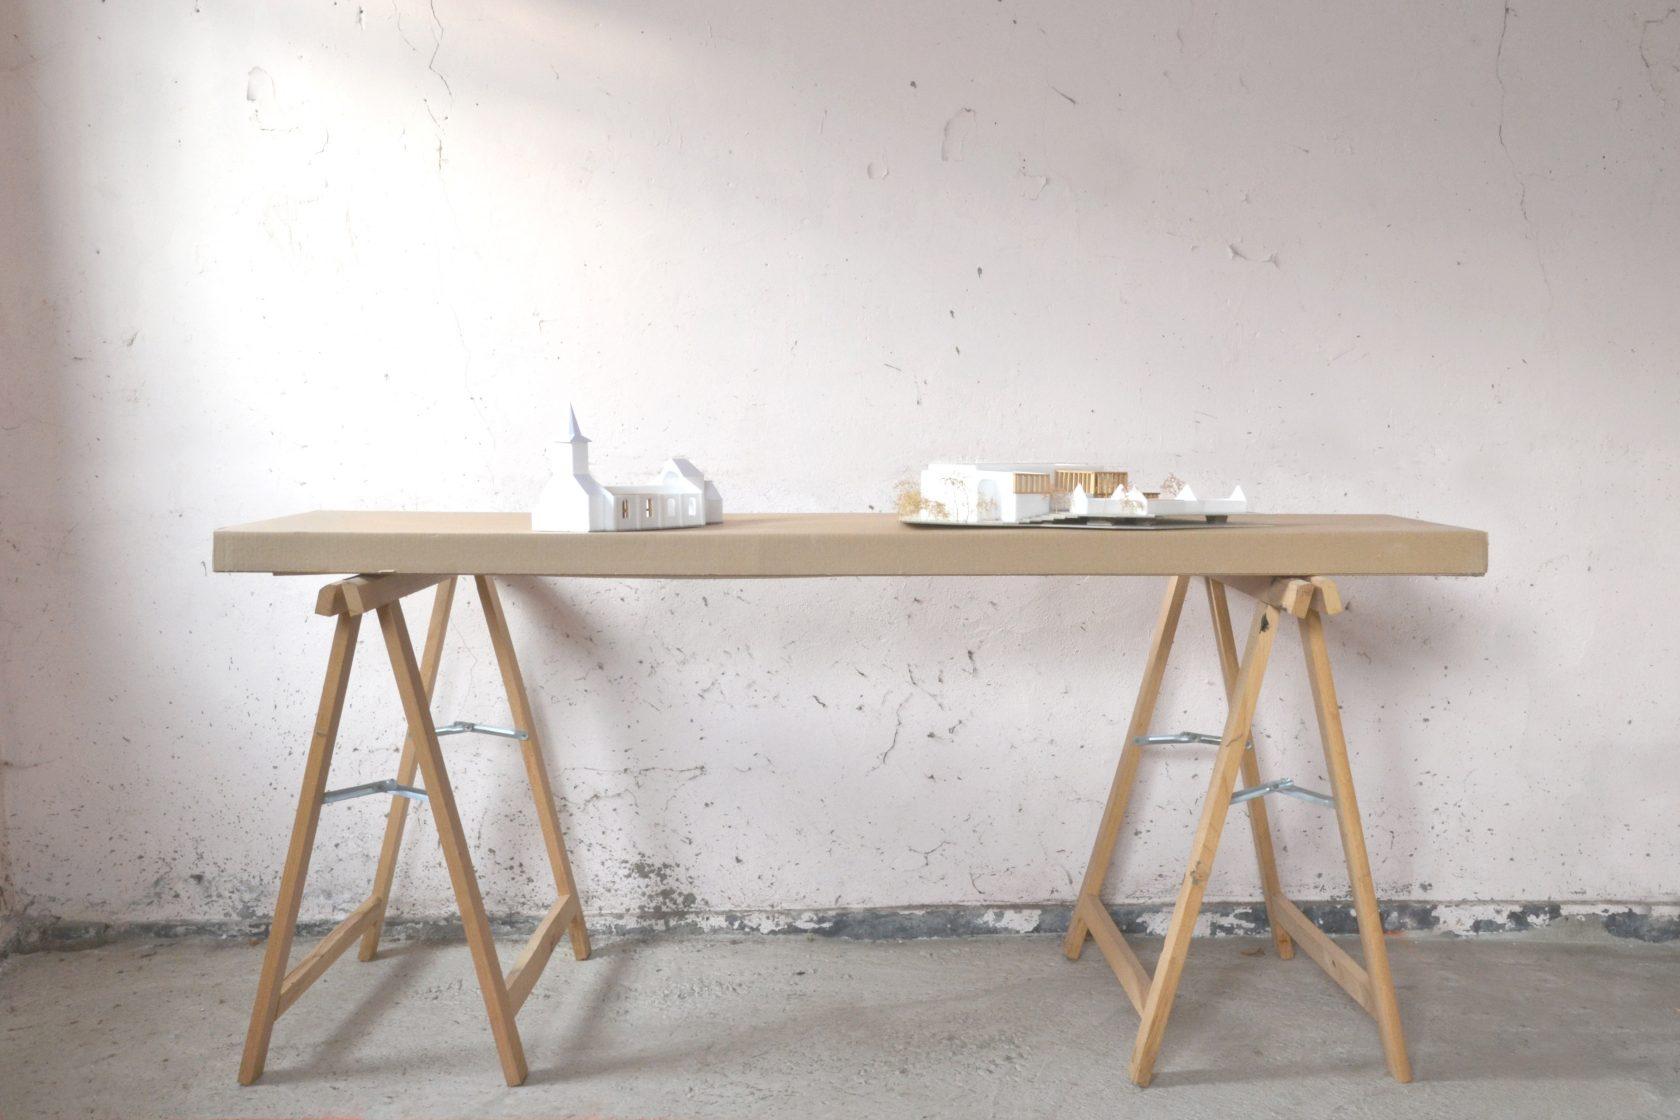 BCQ architecten & ARC - maquette 01 Aalbeke